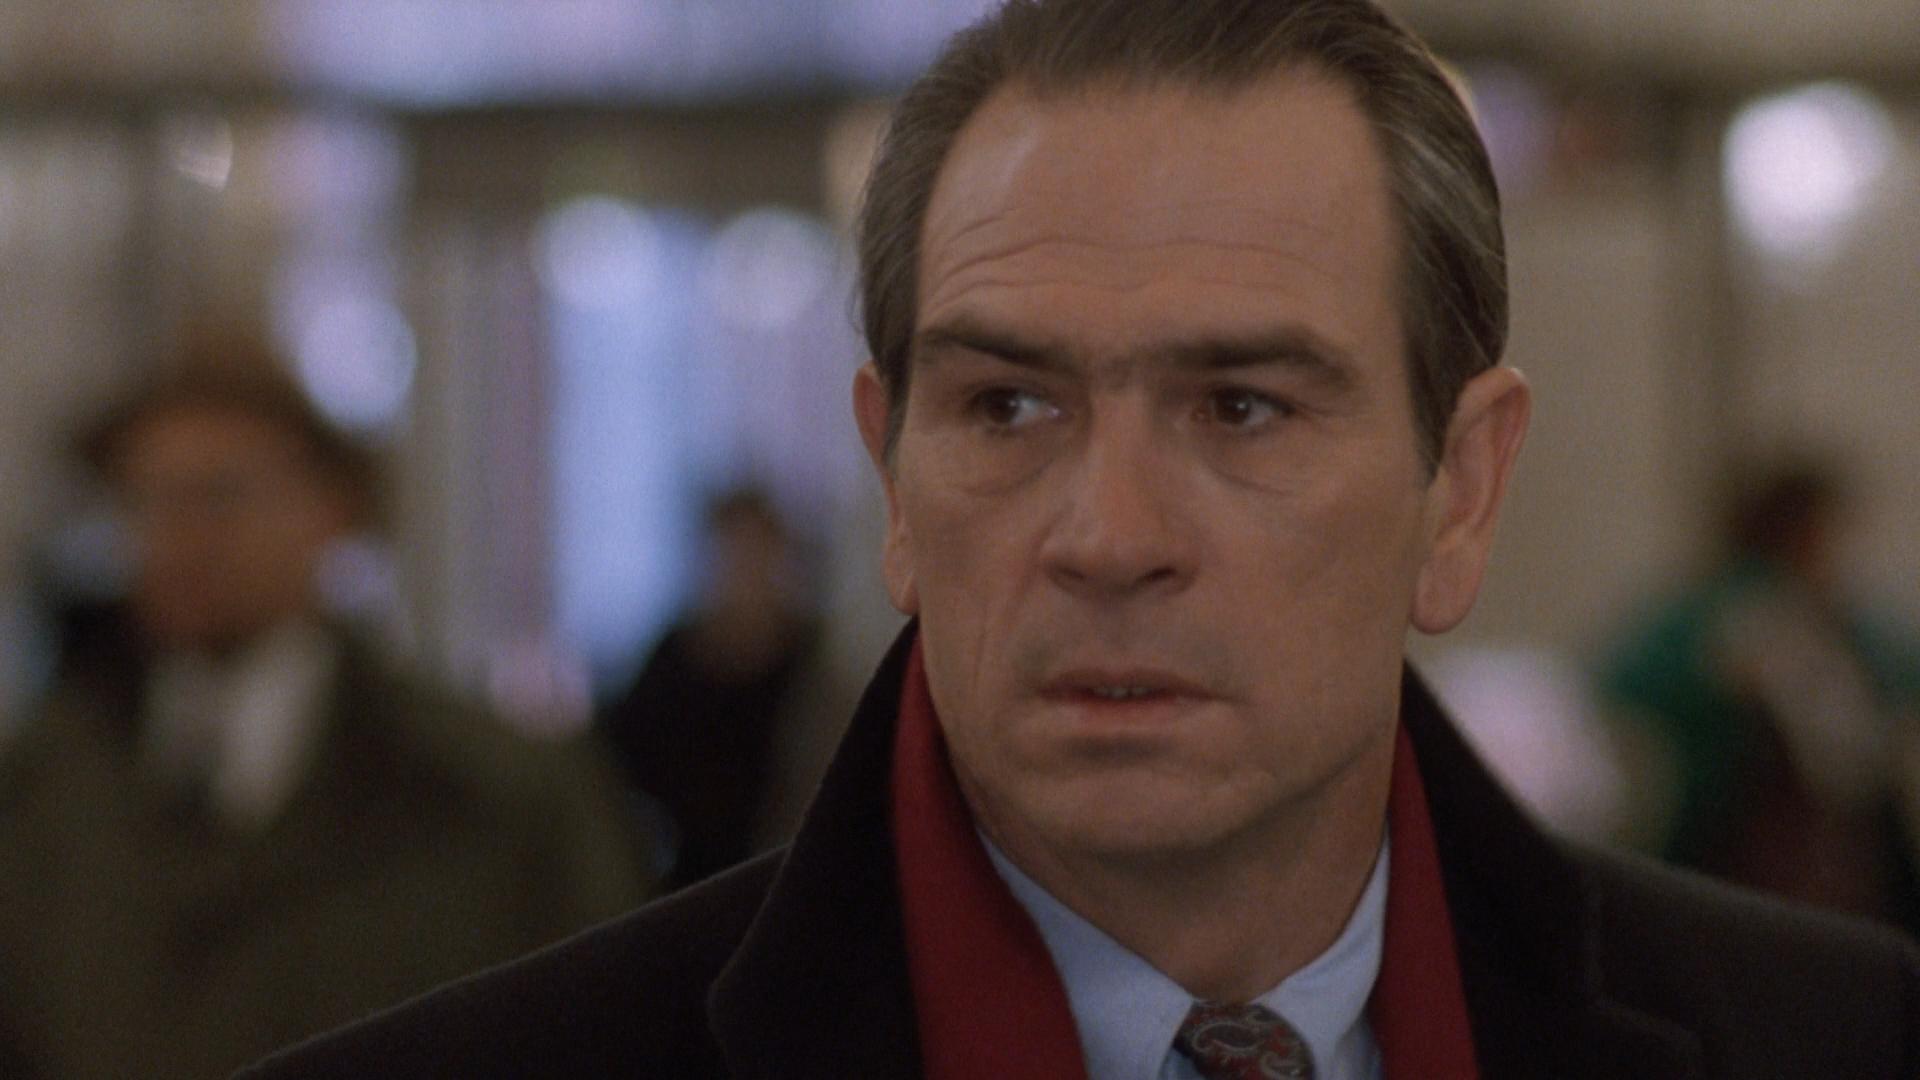 The.Fugitive.1993.1080p.BluRay.12xRus.Eng.HDCLUB-SbR.mkv_snapshot_01.17.38_[2015.03.02_07.38.49].png